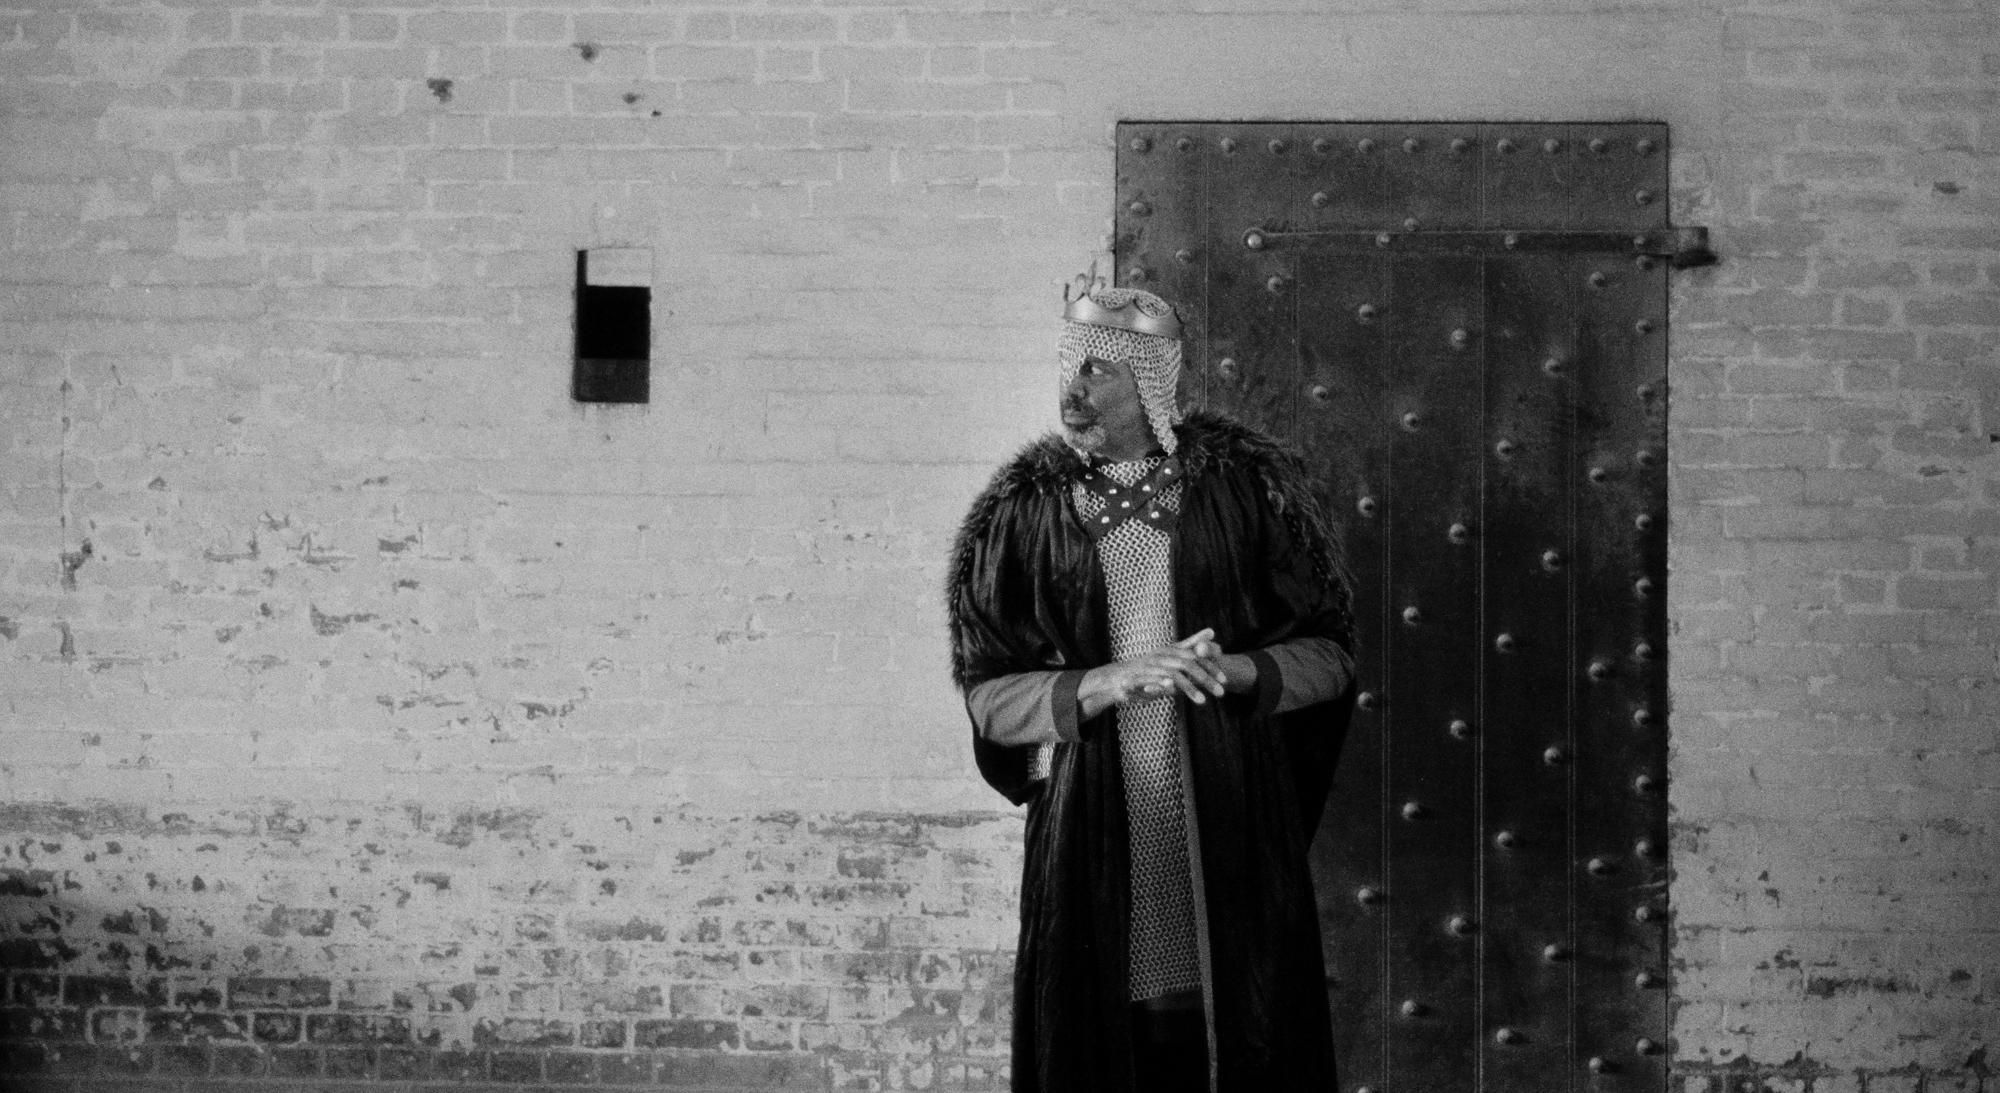 Art and Documentary Photography - Loading king-stephen-de-blois-by-douglas-despres-16.jpg